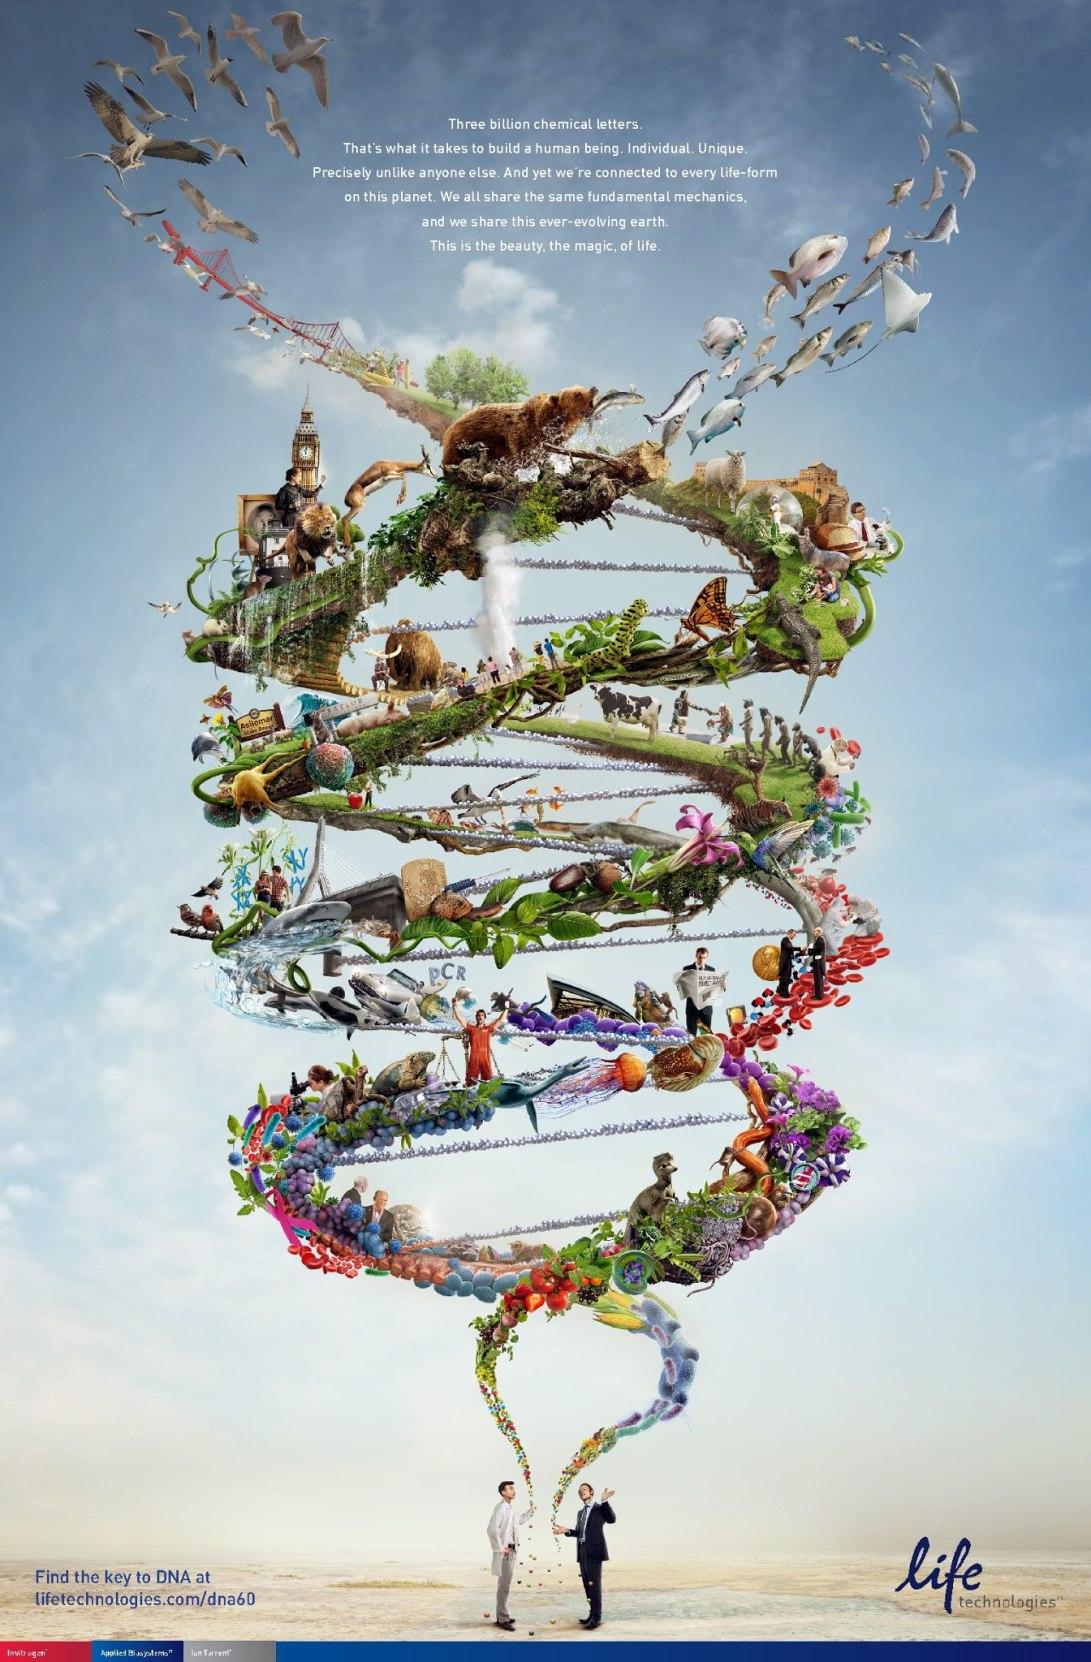 DNA Helix Structure for Life Technologies by Ricardo Salamanca / Salamagica